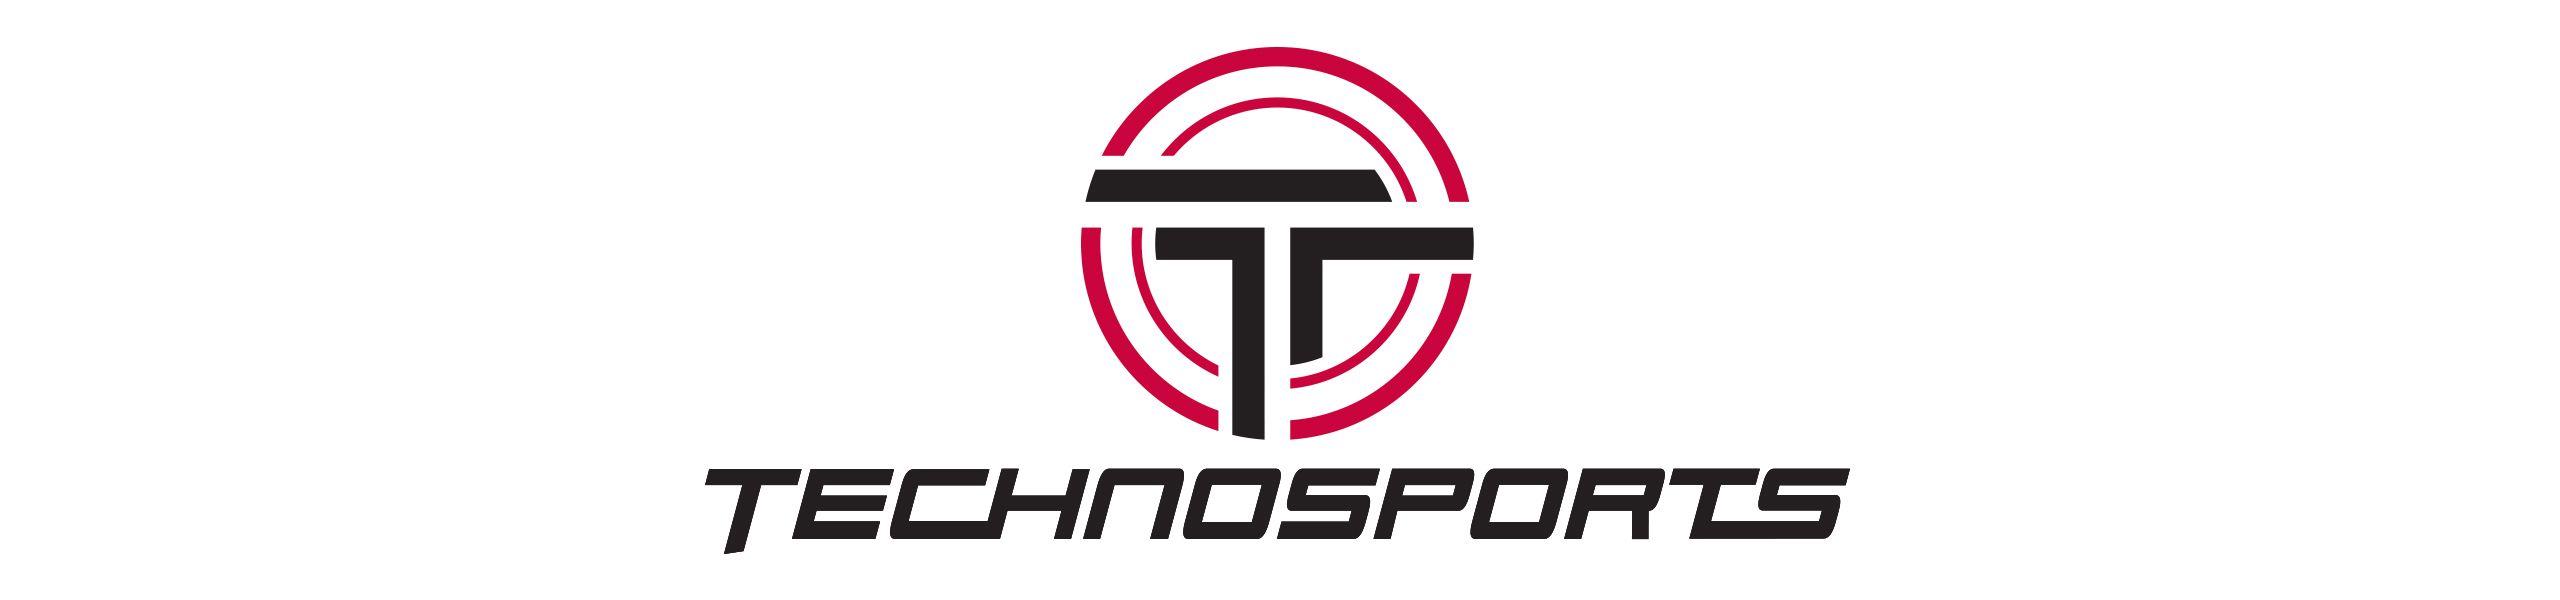 technosports-small-business-header